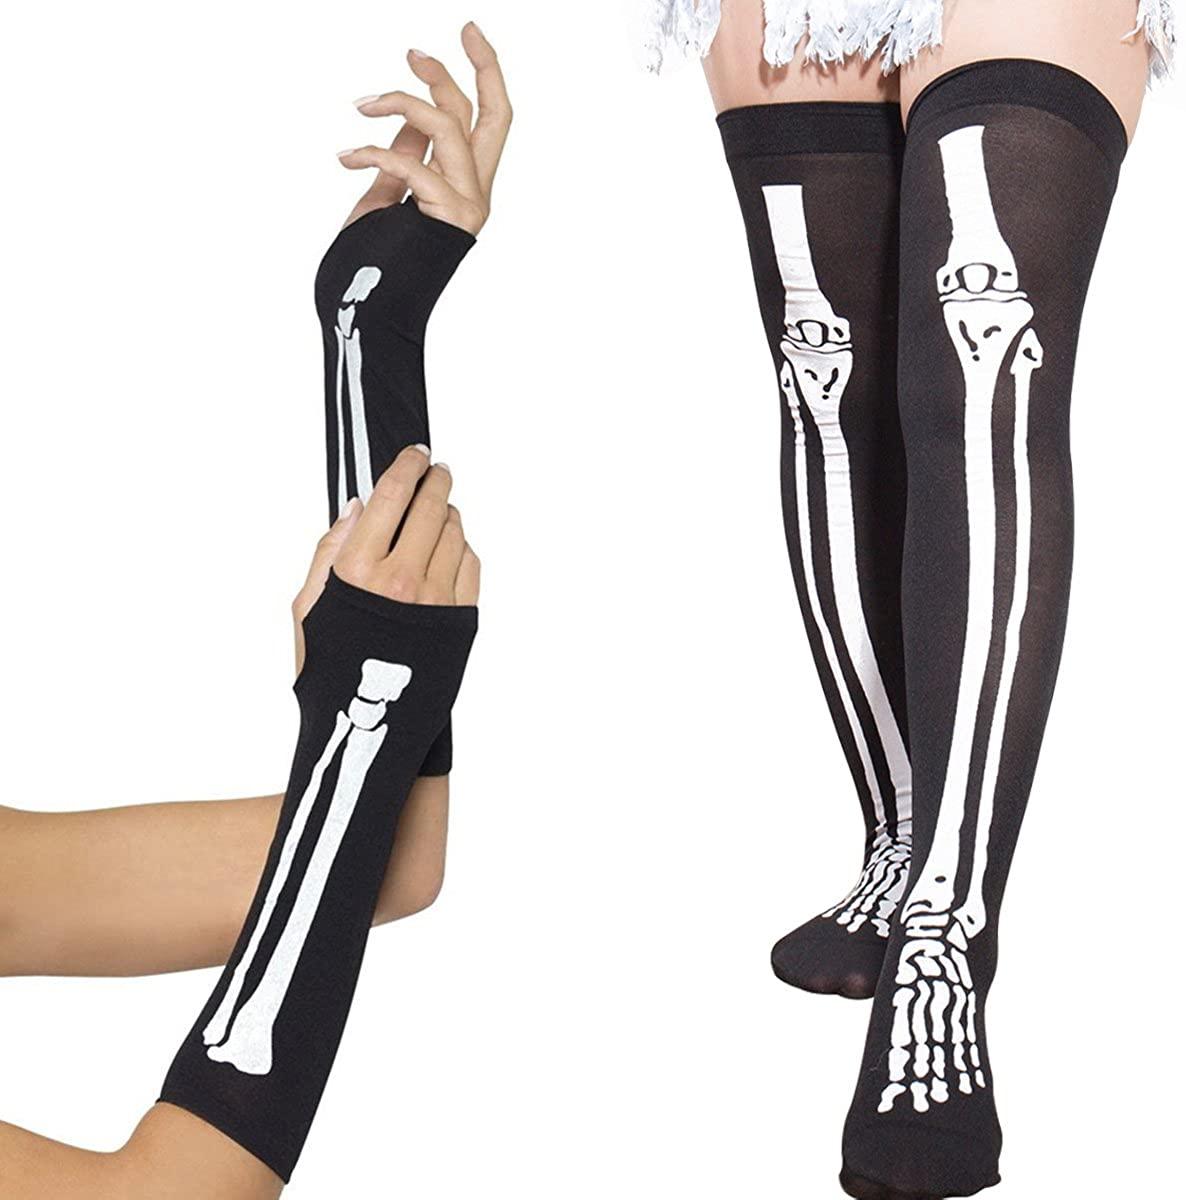 SIBOSUN Halloween Costume Women's Skeleton Fingerless Gloves & Stockings Party